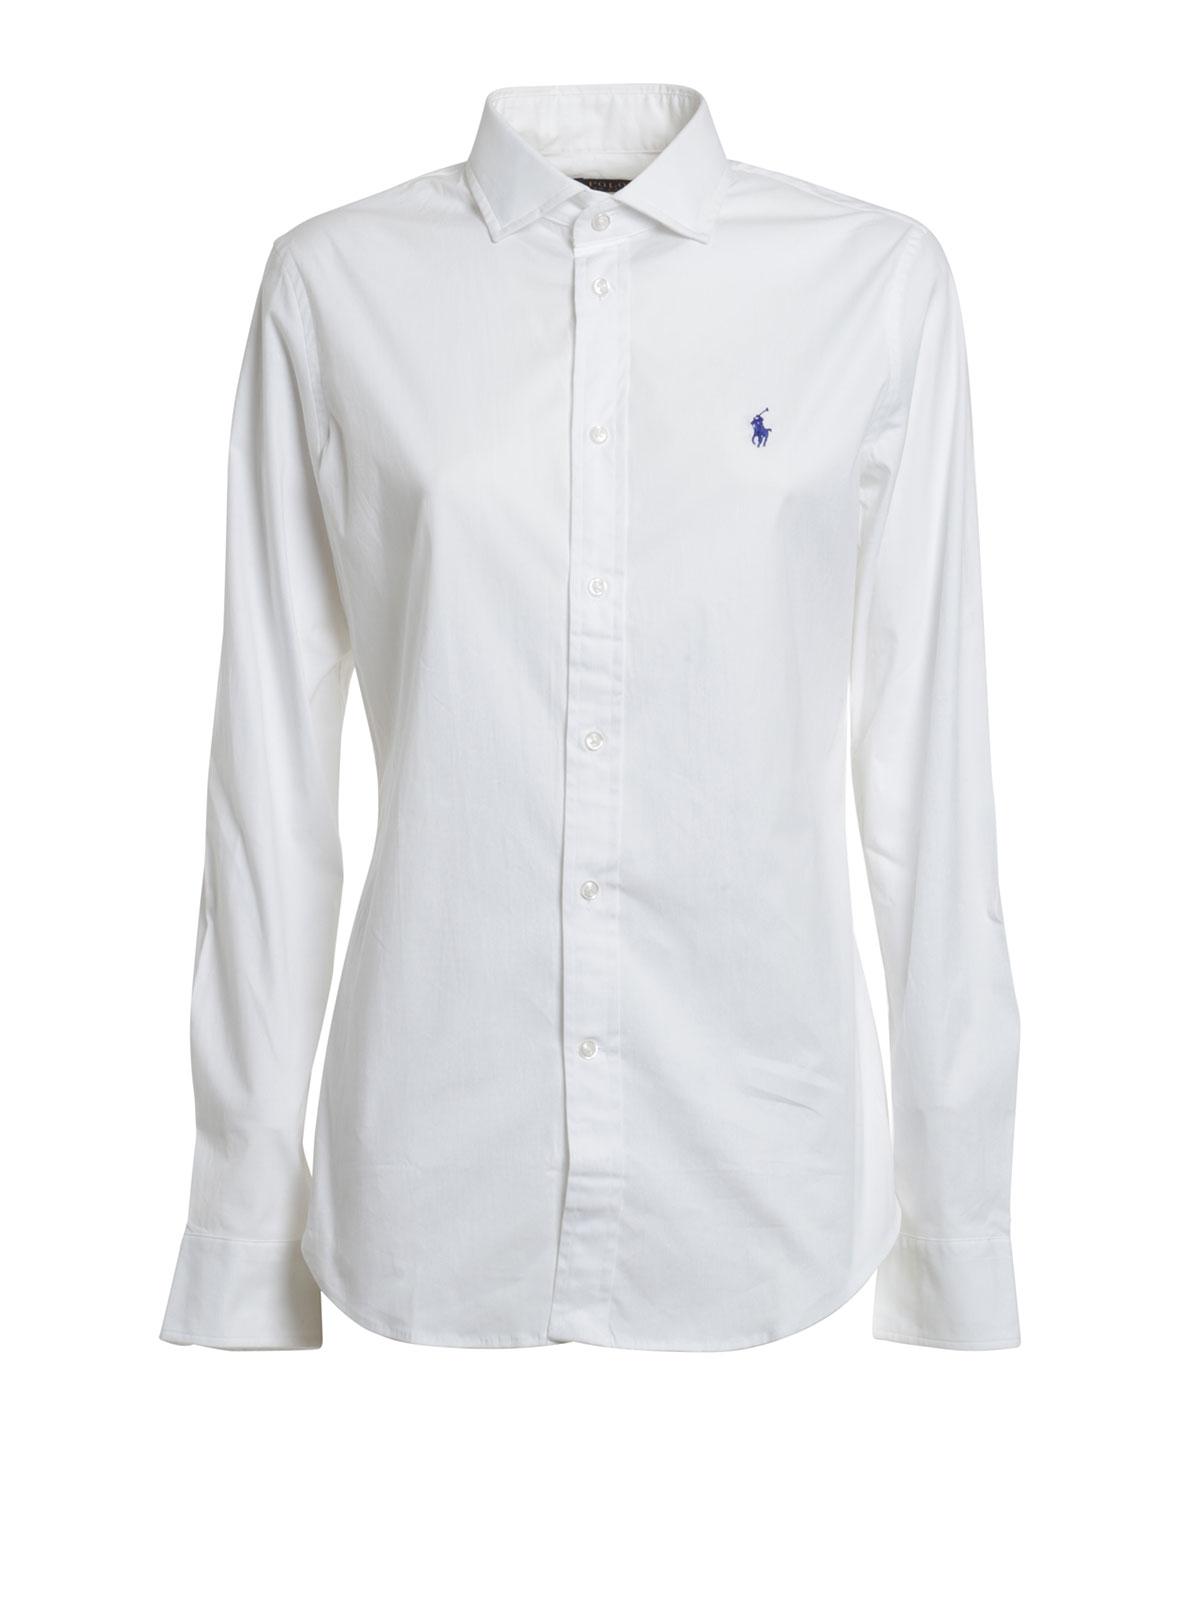 Lauren Chemises Chemise V33 Blanc Femme Ig270 Polo Ralph Pour W9DH2IYE